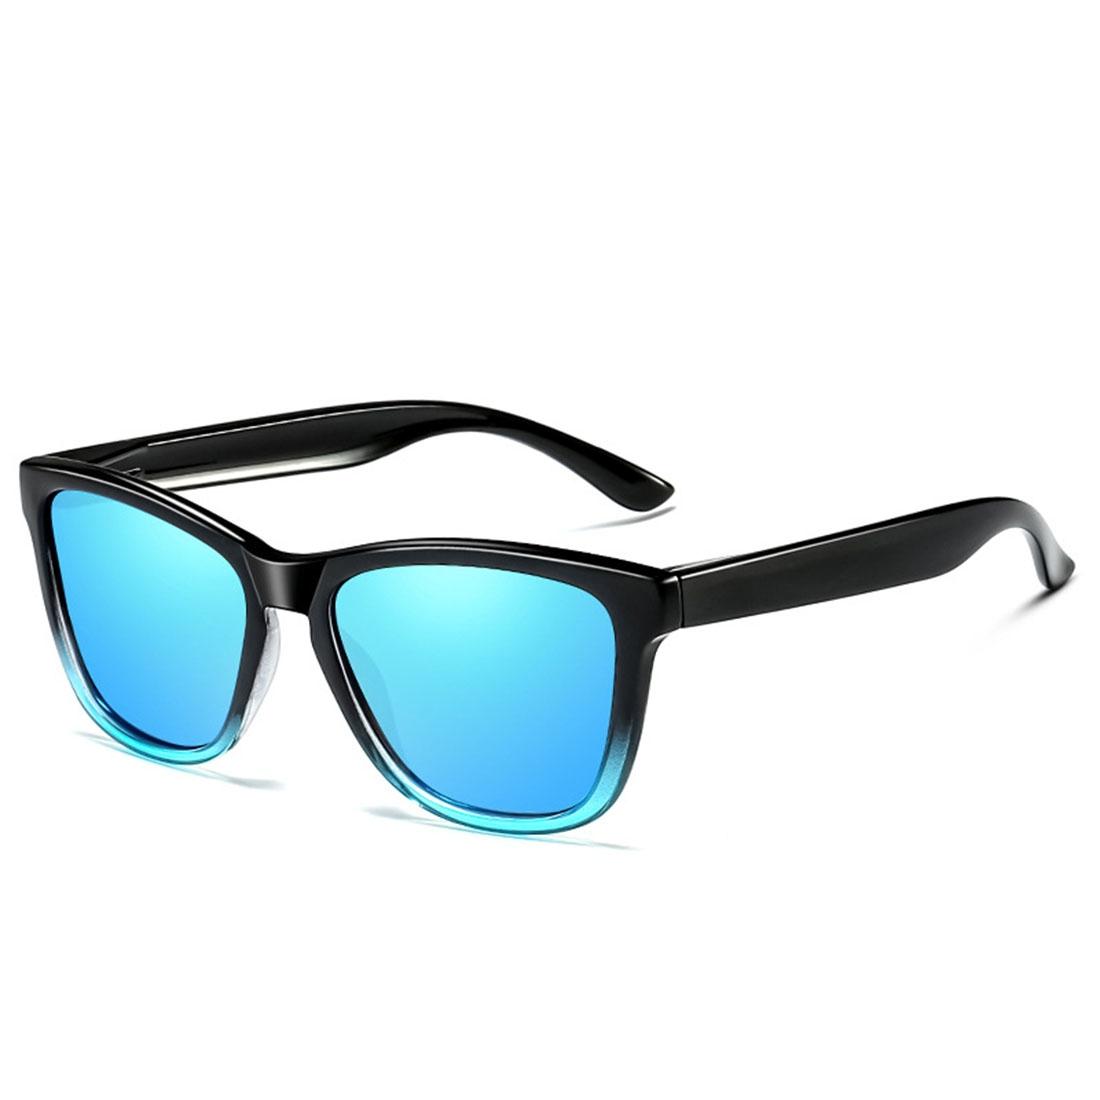 Unisex Retro Fashion Plastic Frame UV400 Polarized Sunglasses (Gradient Black + Blue)